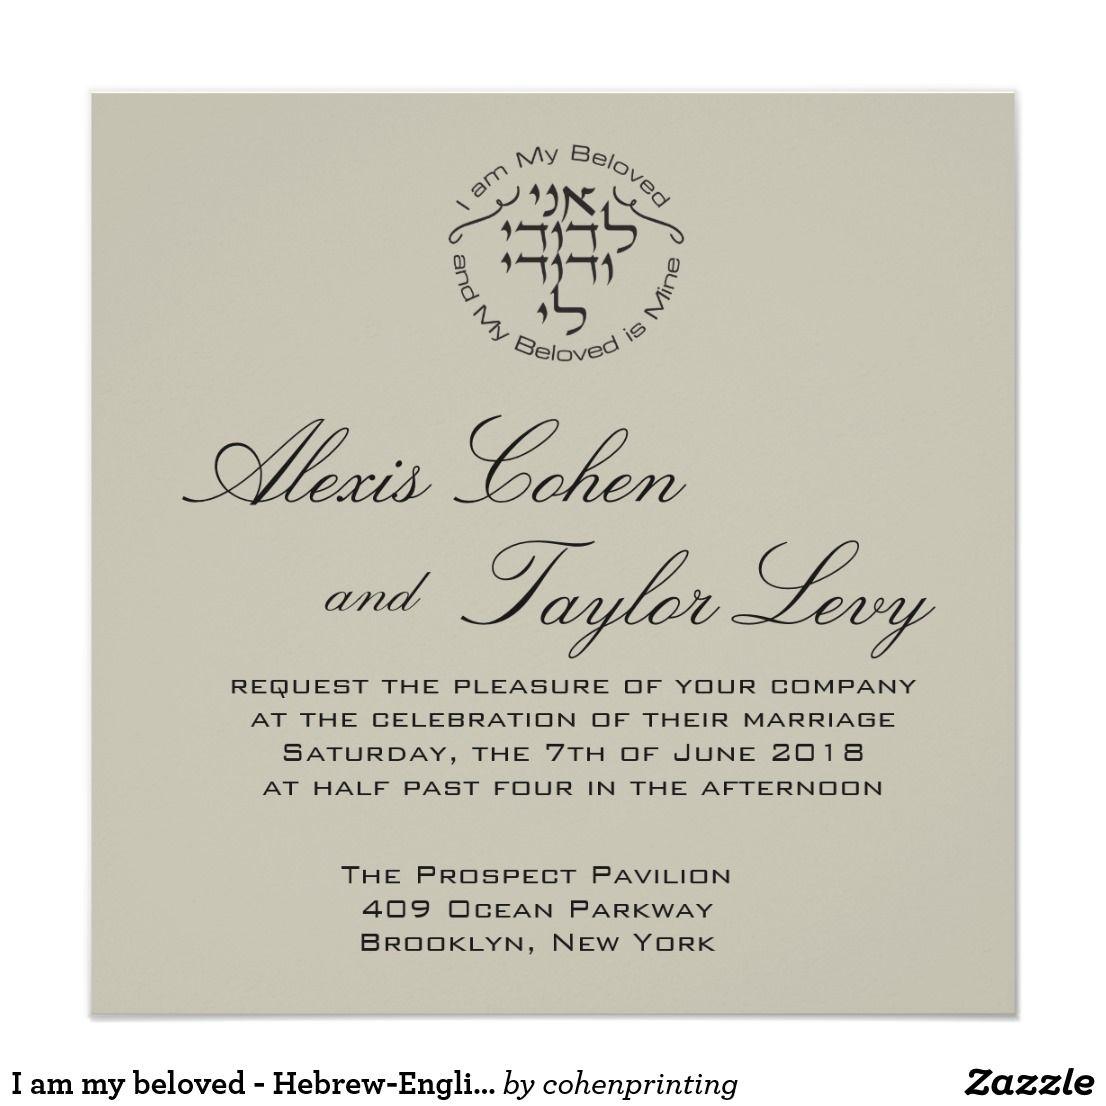 I am my beloved - Hebrew-English Wedding Invite   Zazzle Store ...